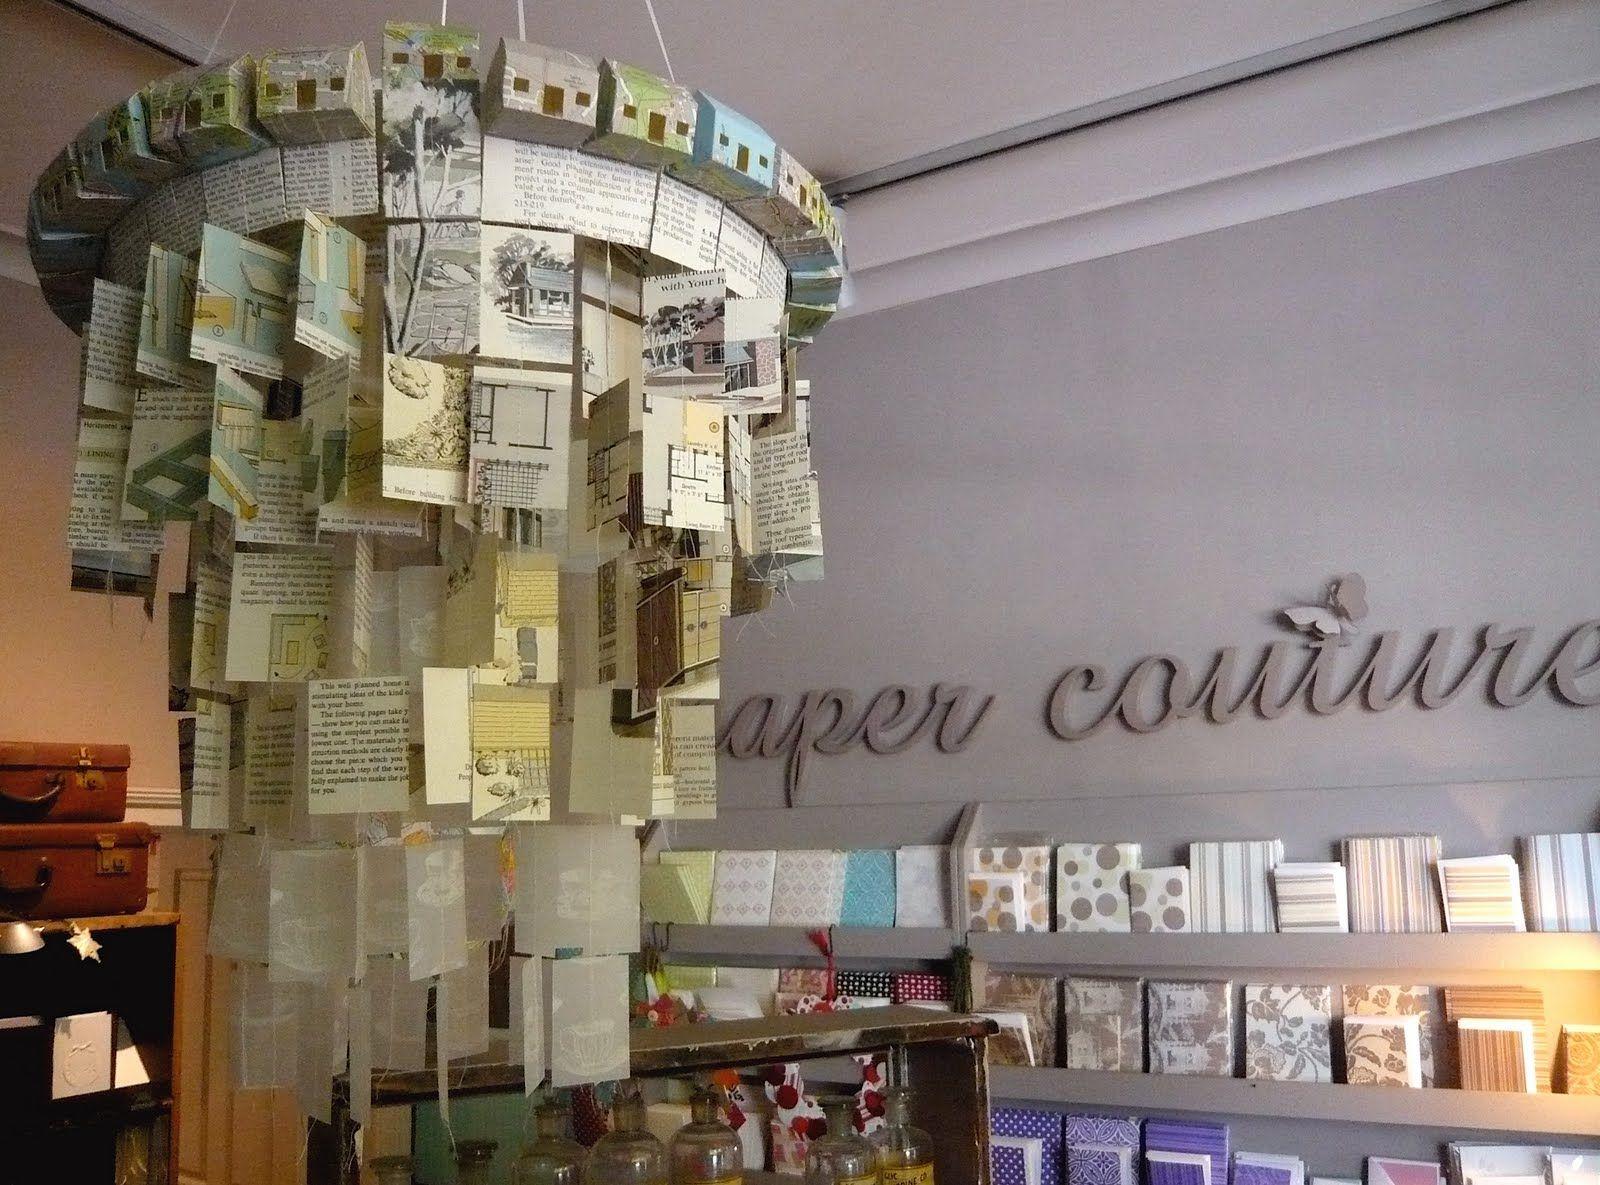 Paper Chandelier   Lighting   Pinterest   Paper chandelier, Craft ... for Paper Chandelier Craft  155fiz